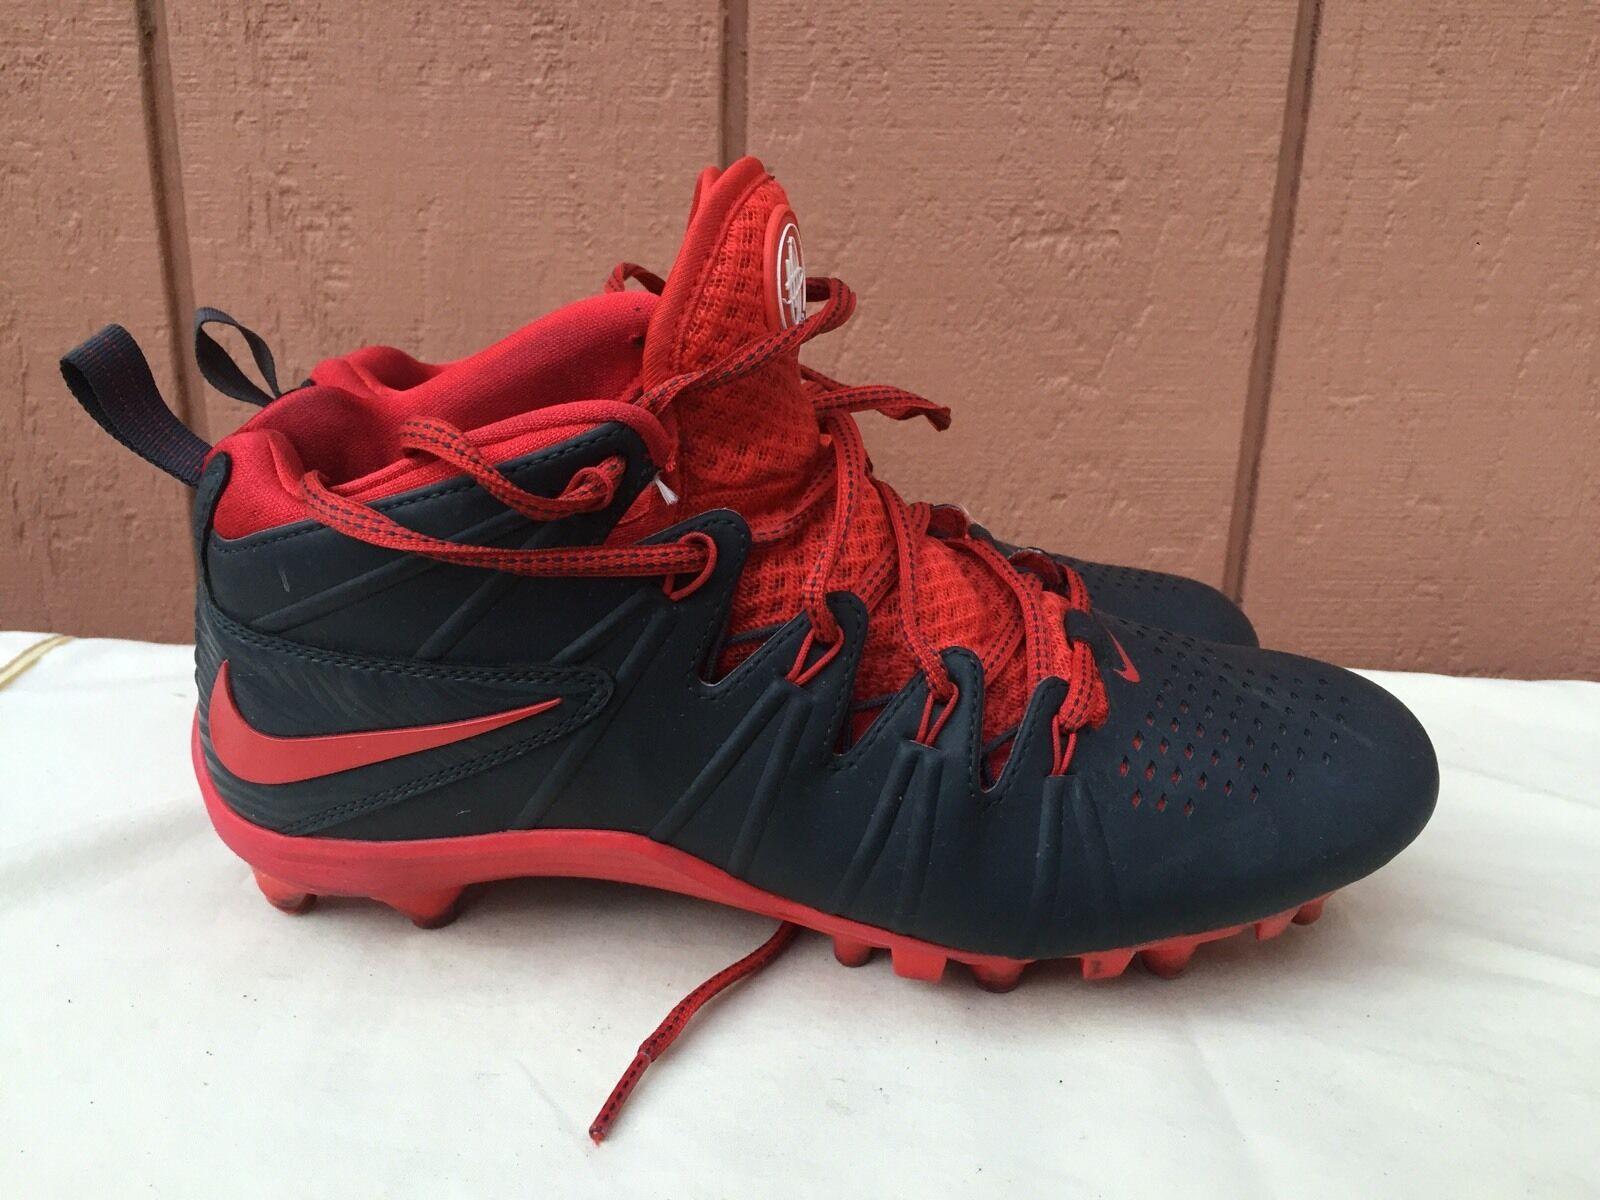 EUC Mens Nike Huarache Black Red Cleats Sport Shoes US 8